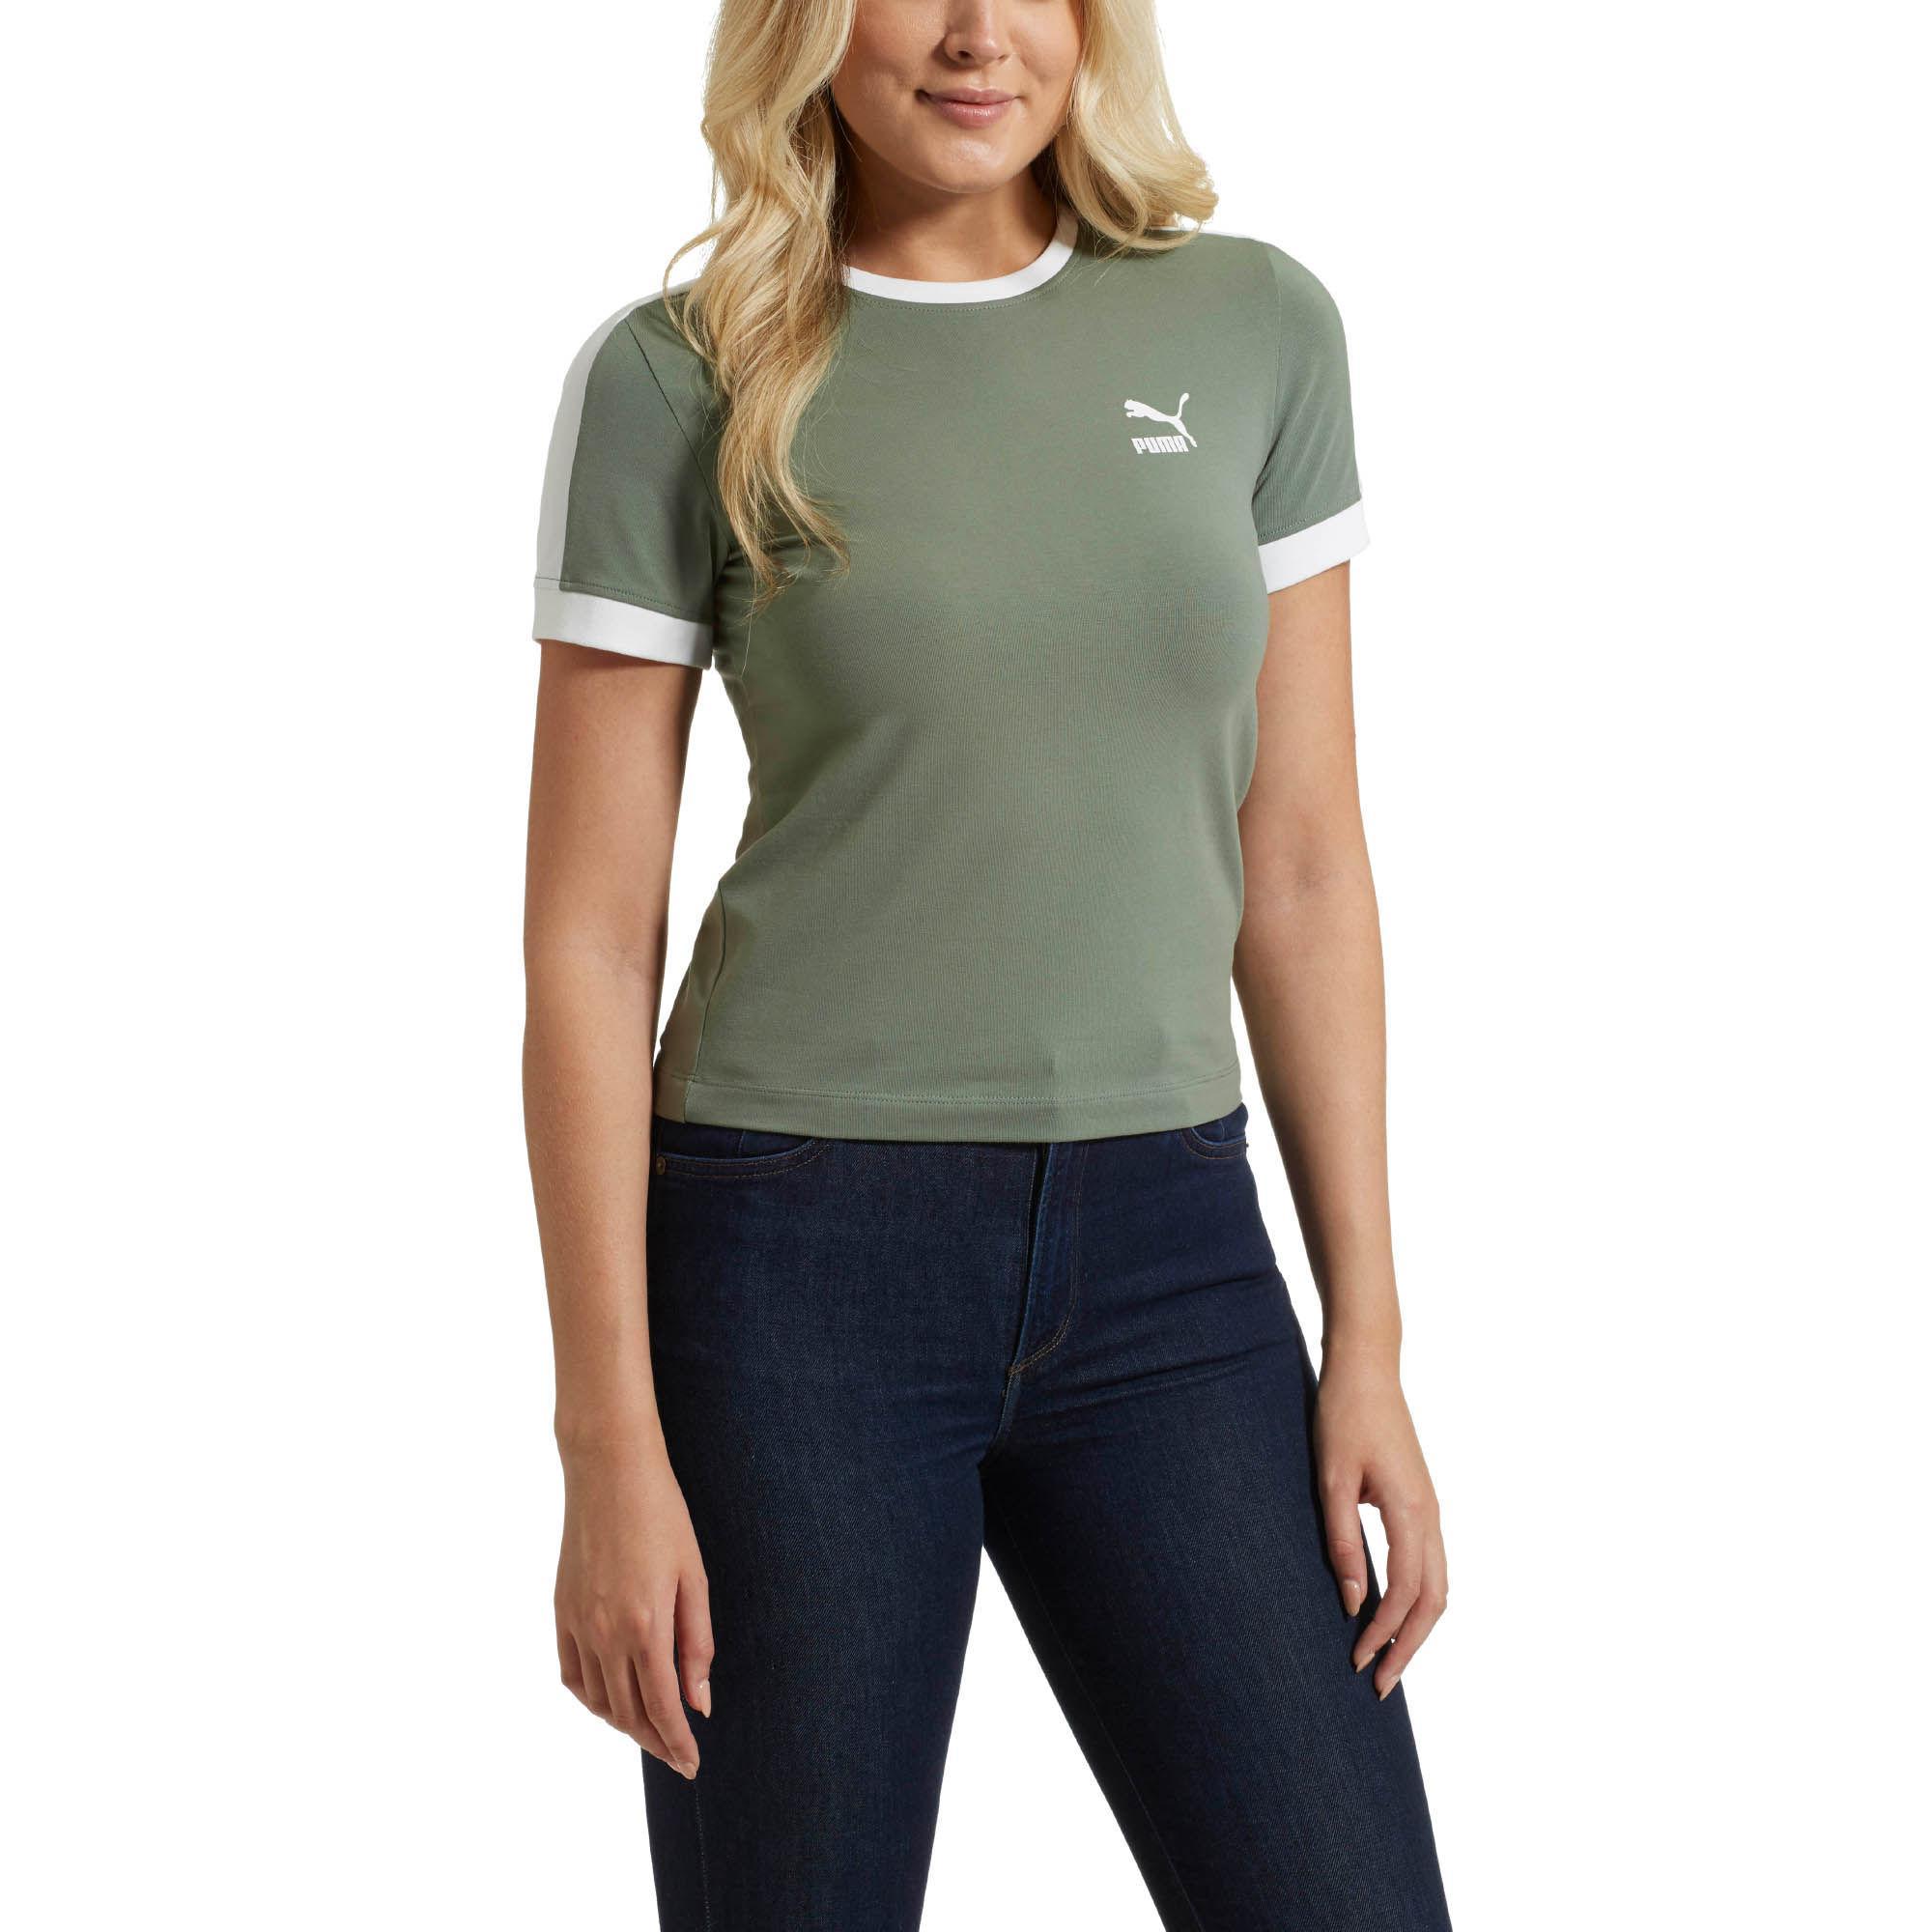 a2561a61901 PUMA Classic T7 Slim T-shirt in Green - Lyst